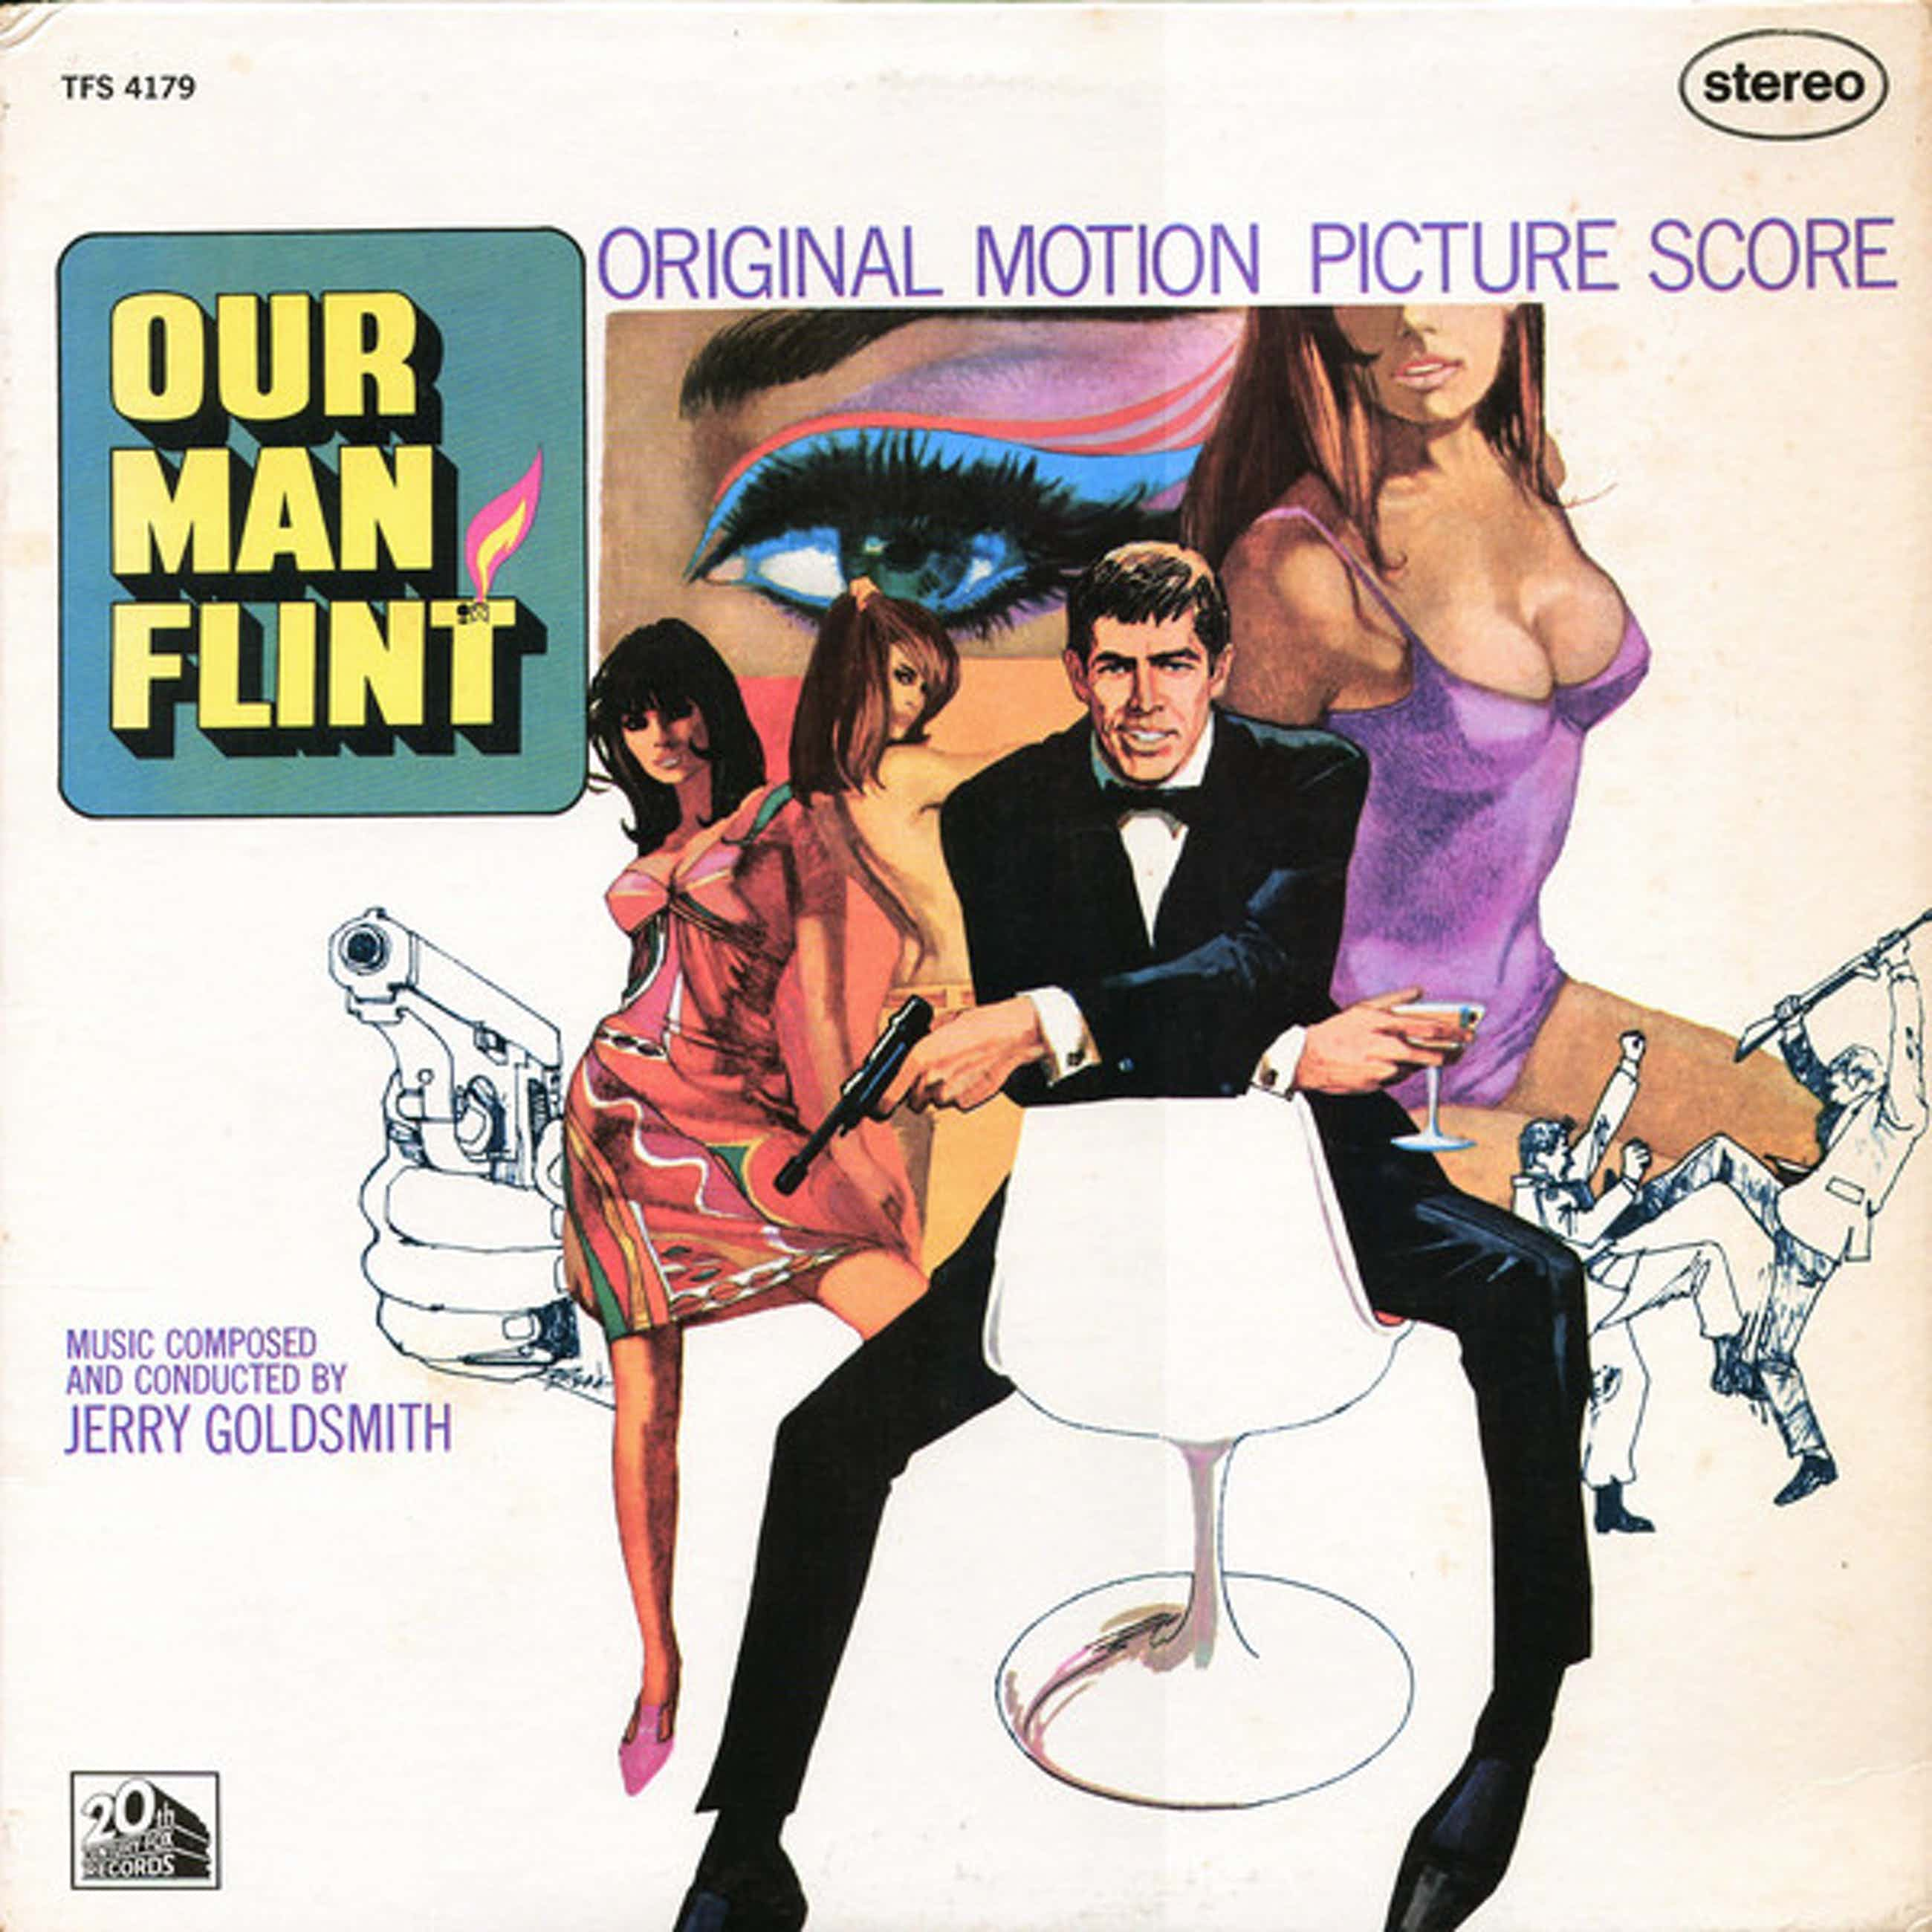 Various artists - Lot van twee lps: Our man Flint, the 25th hour kopen? Bied vanaf 10!